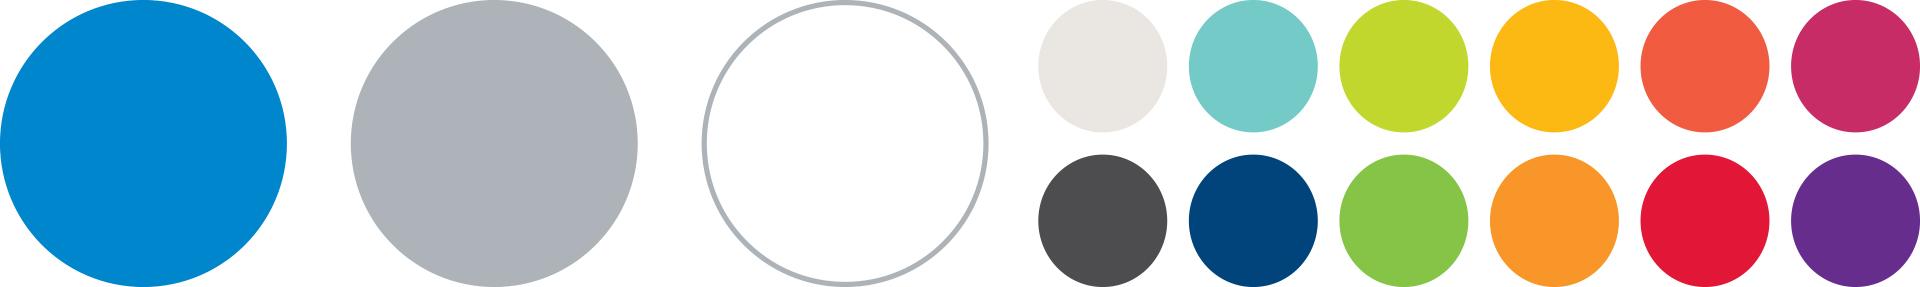 jk_Dell_color_palette